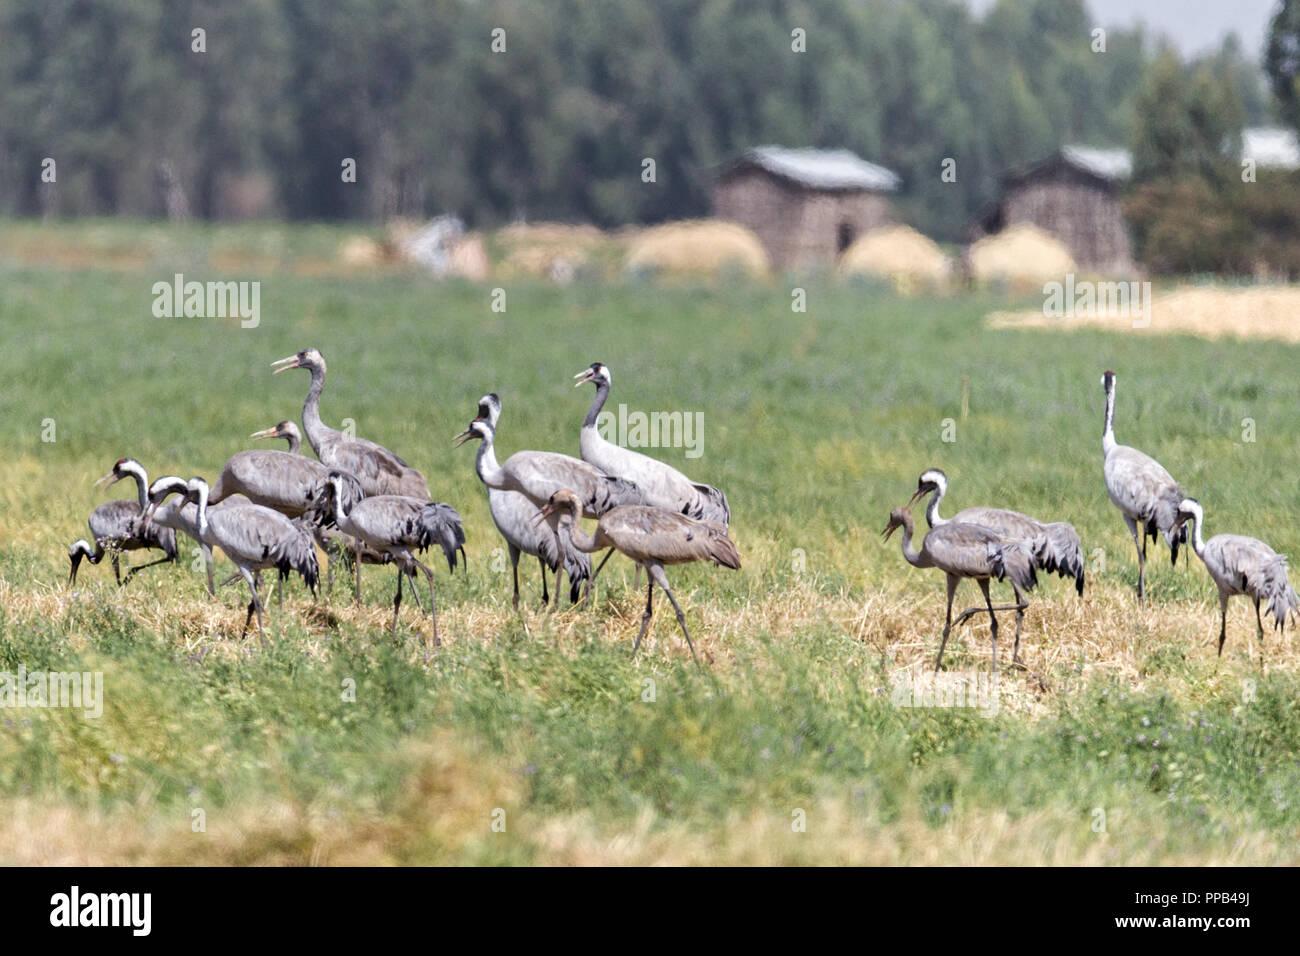 Wattled cranes, Grus carunculata, Bahir Dar region, Ethiopia - Stock Image